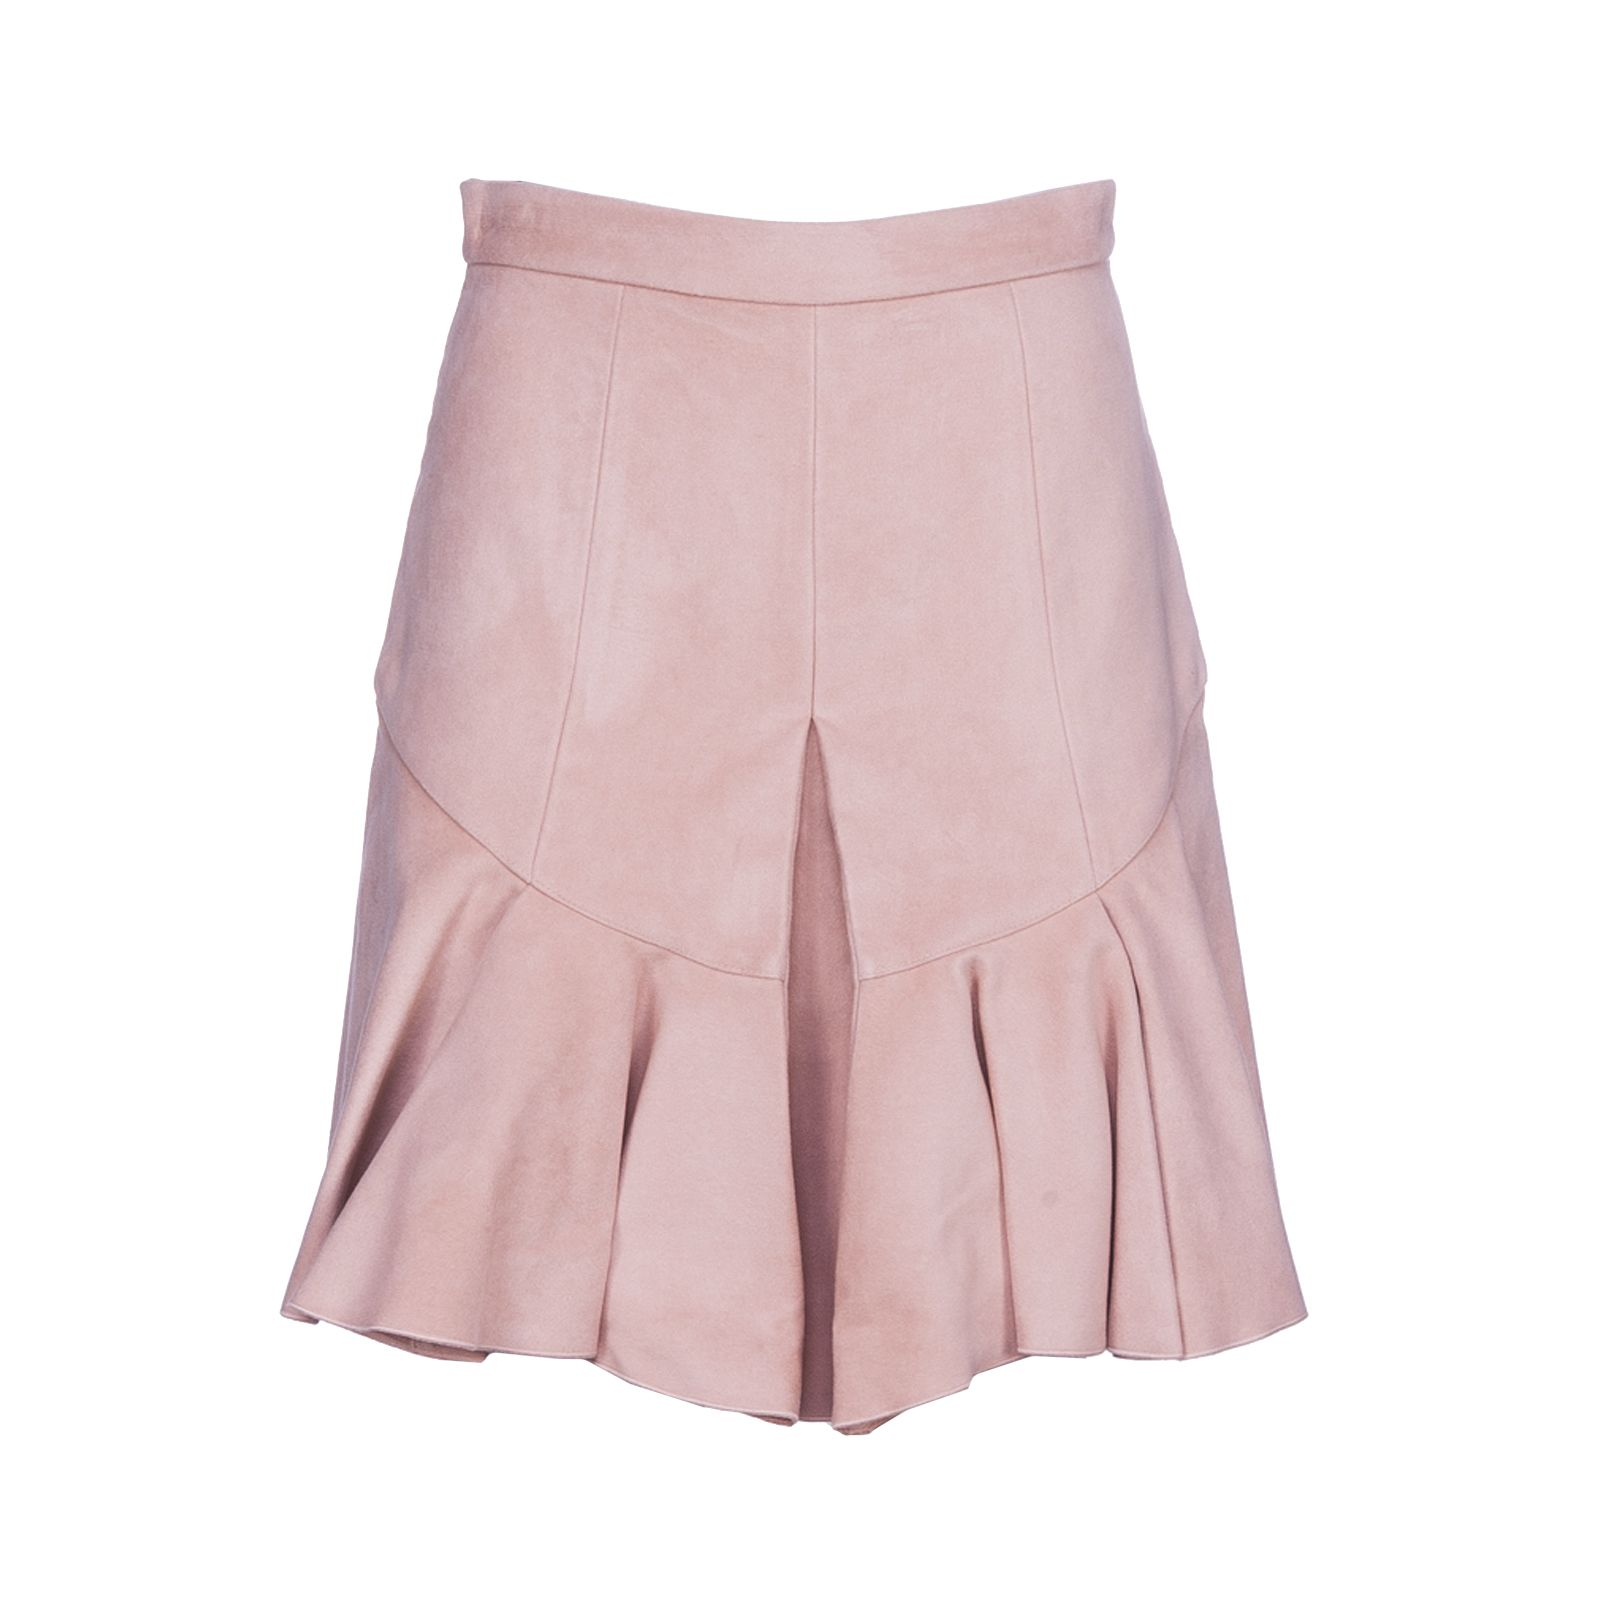 Isabel Marant Parma Skirt